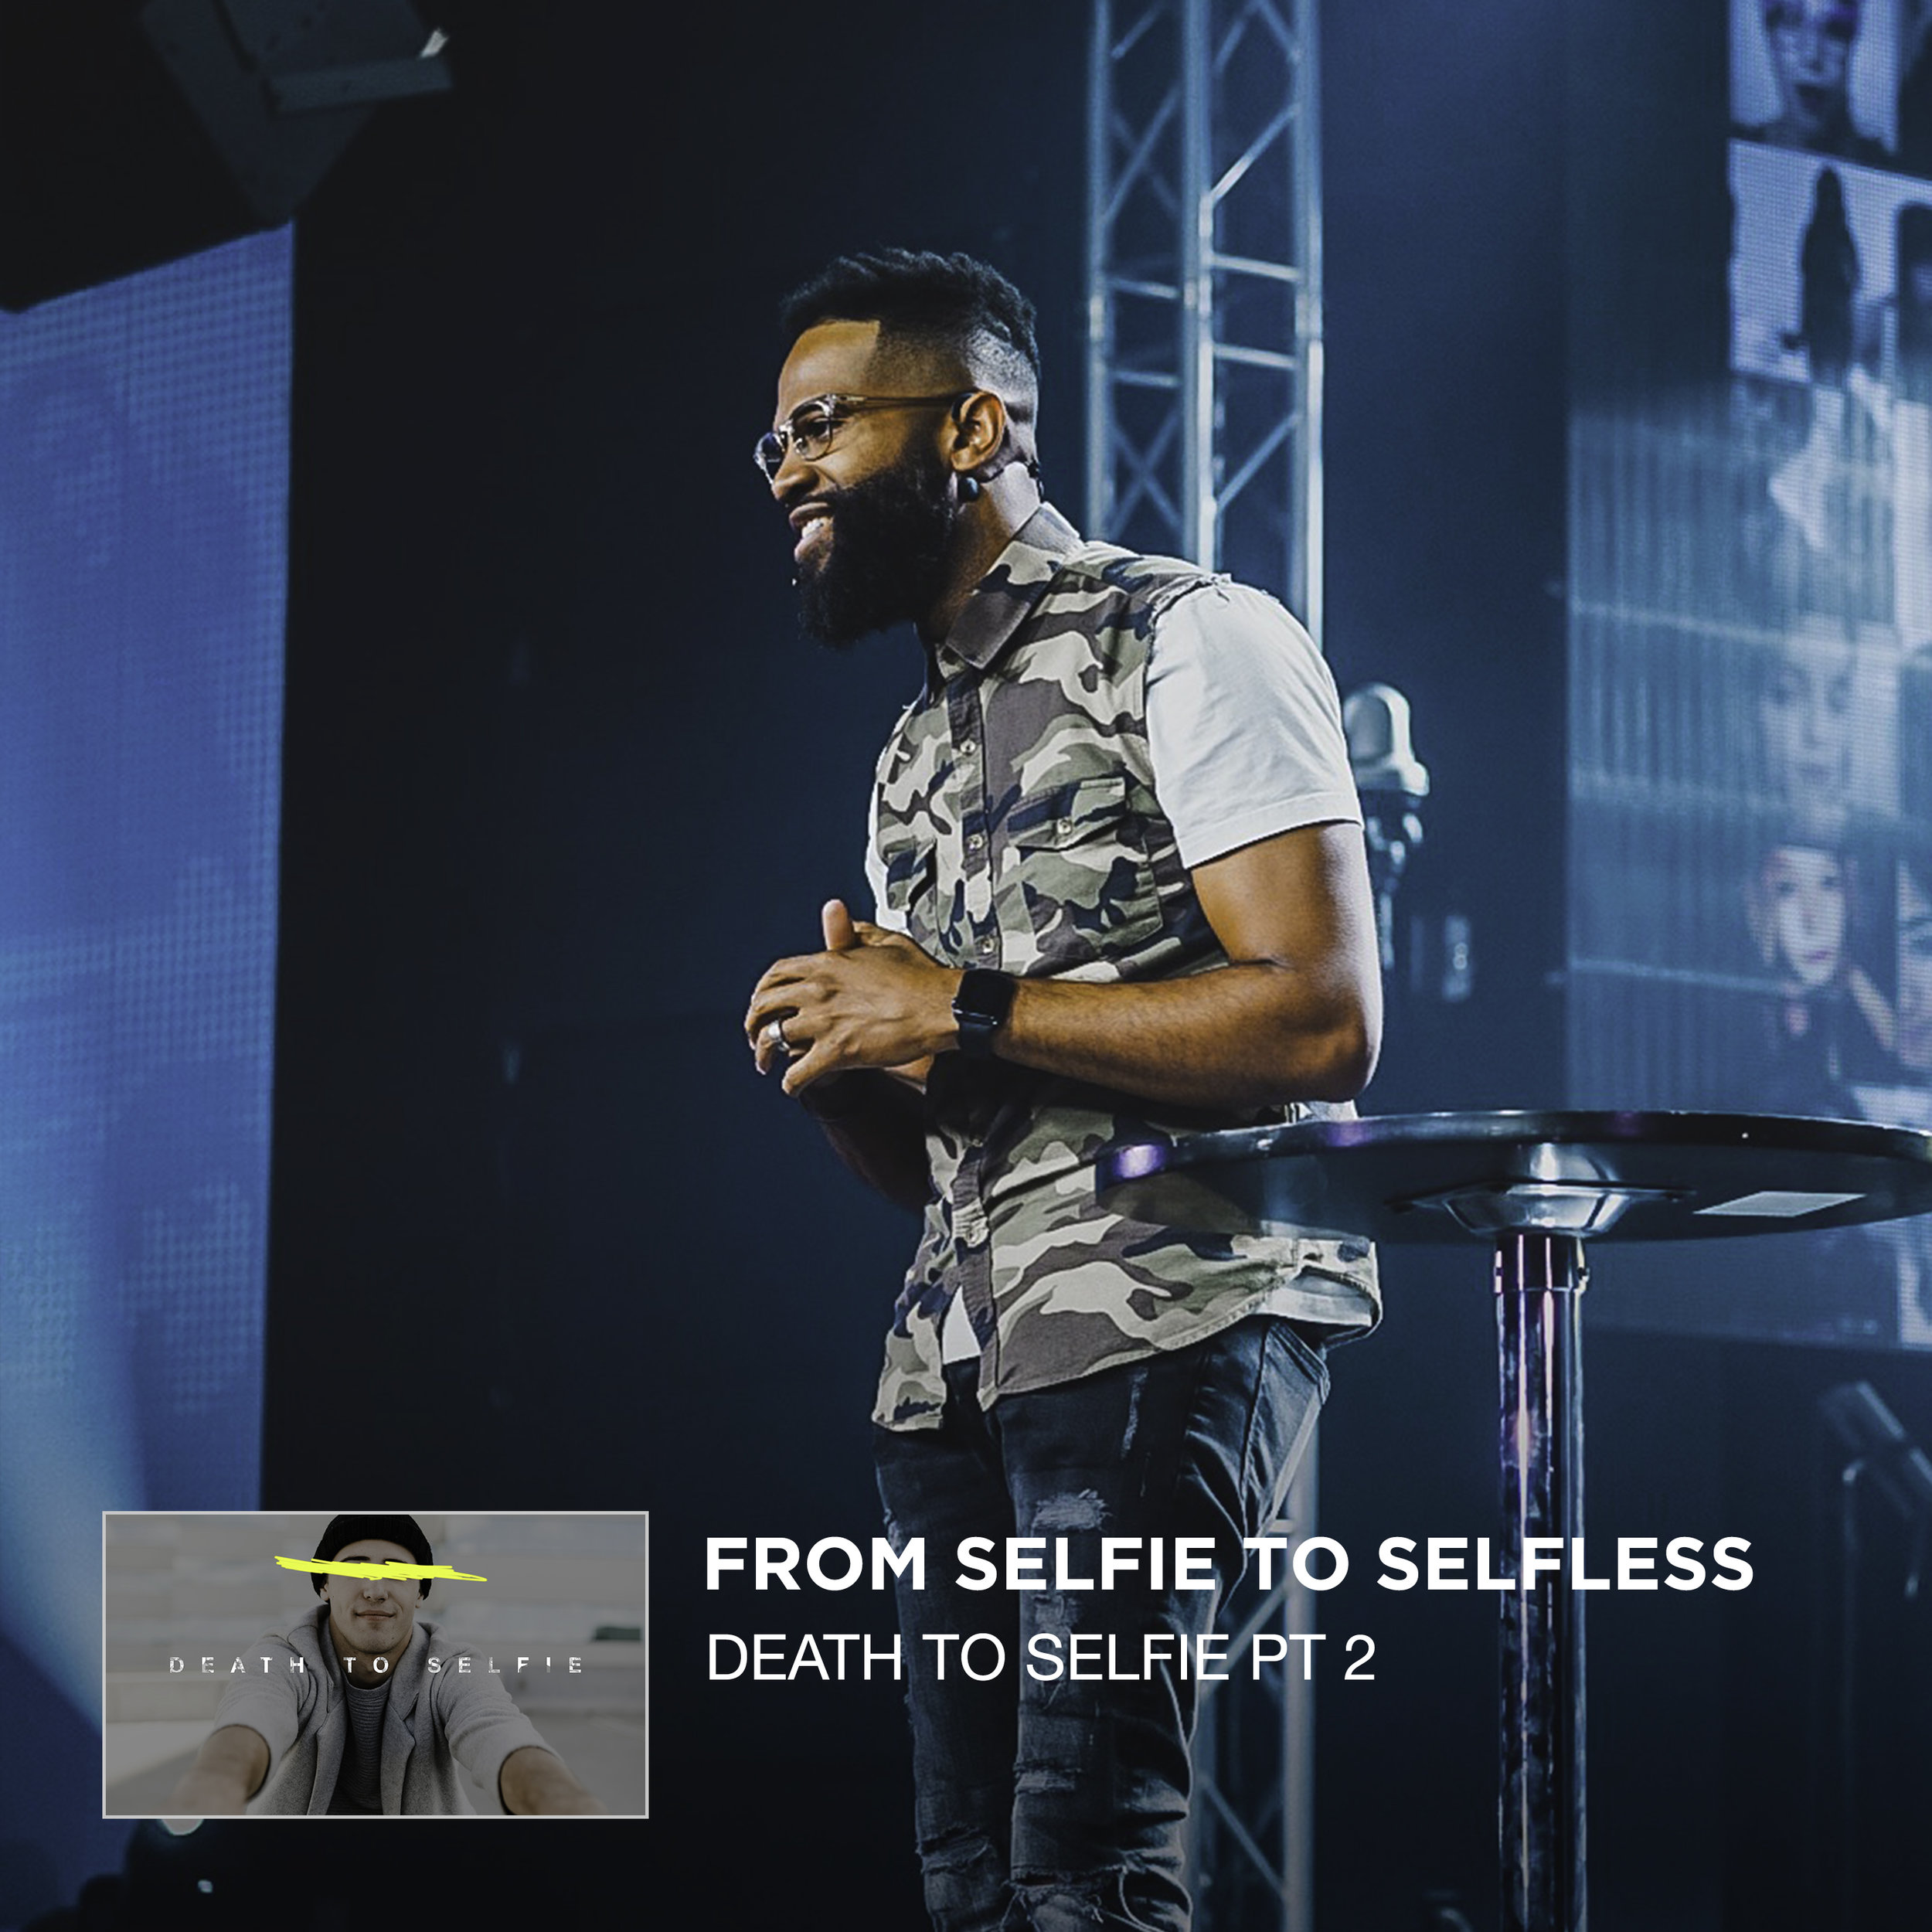 Death To Selfie Pt 2 - From Selfie To Selfless - Anthony Dorris Web.jpg